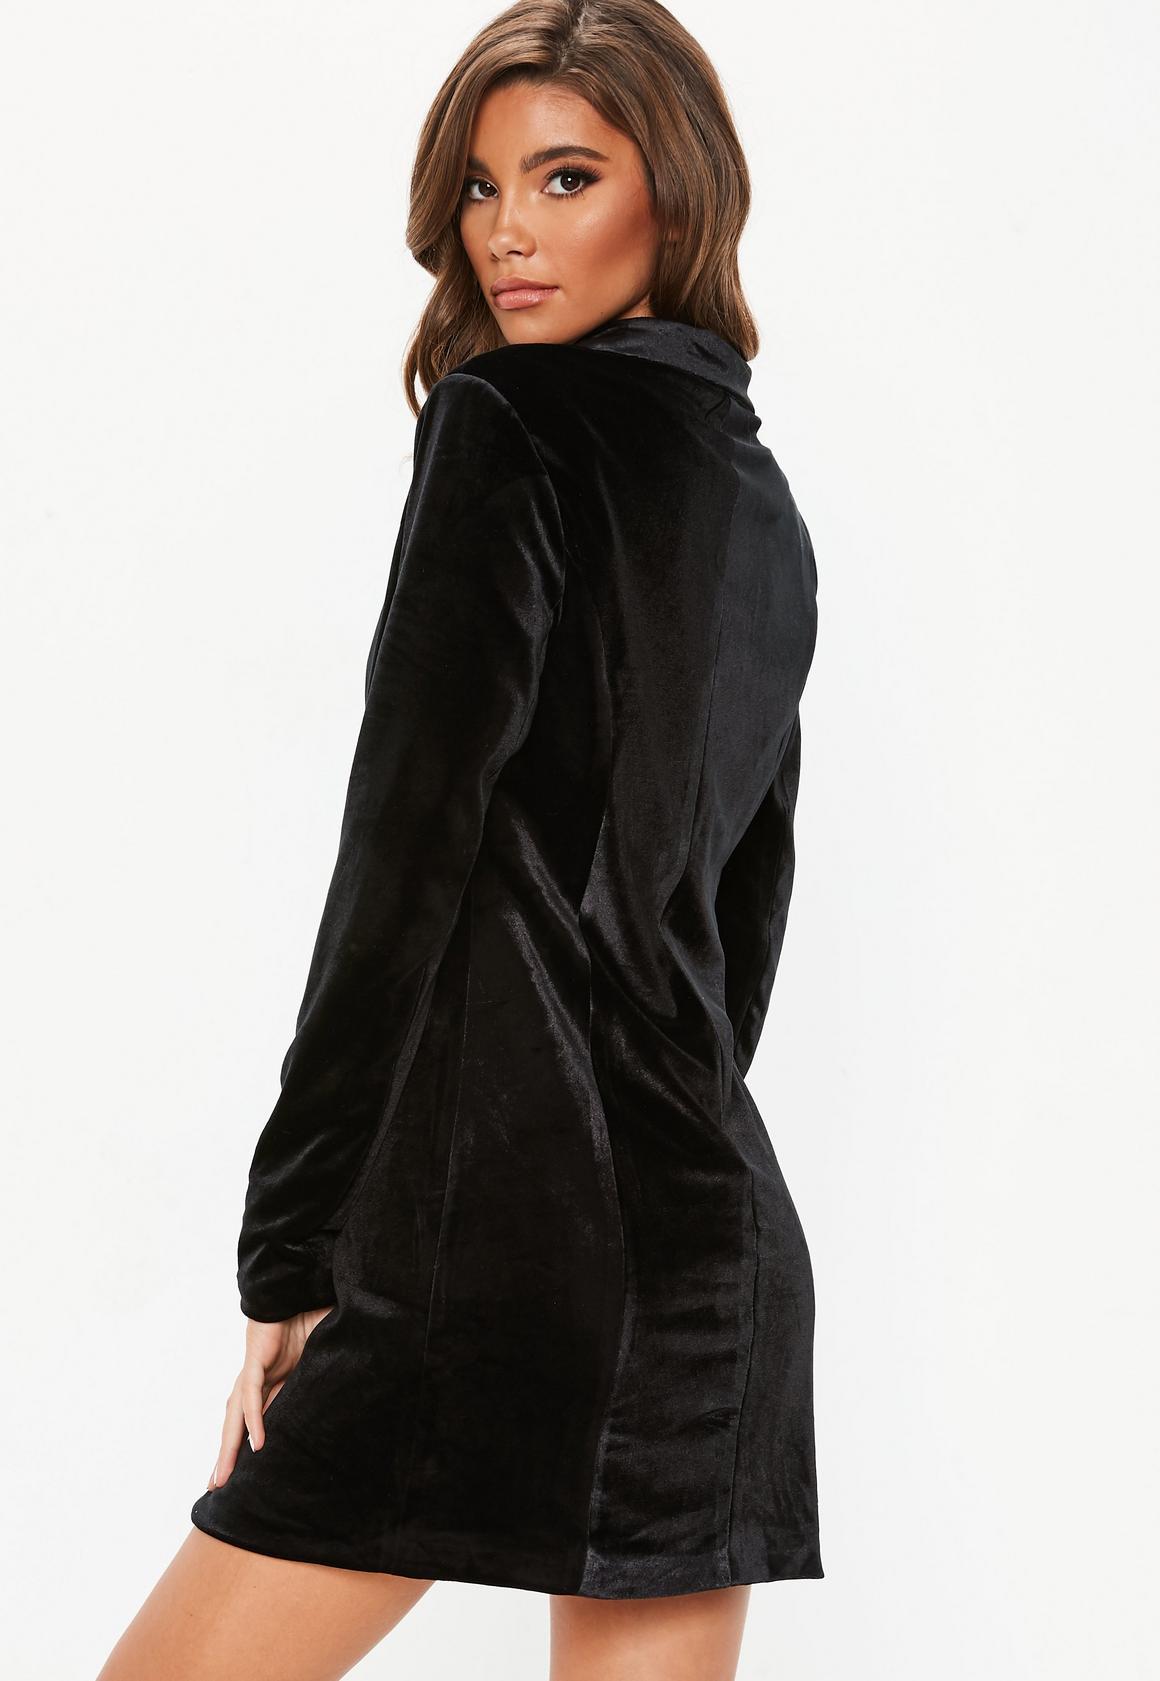 Missguided - robe-blazer en velours e à boutons dorés tall - 2